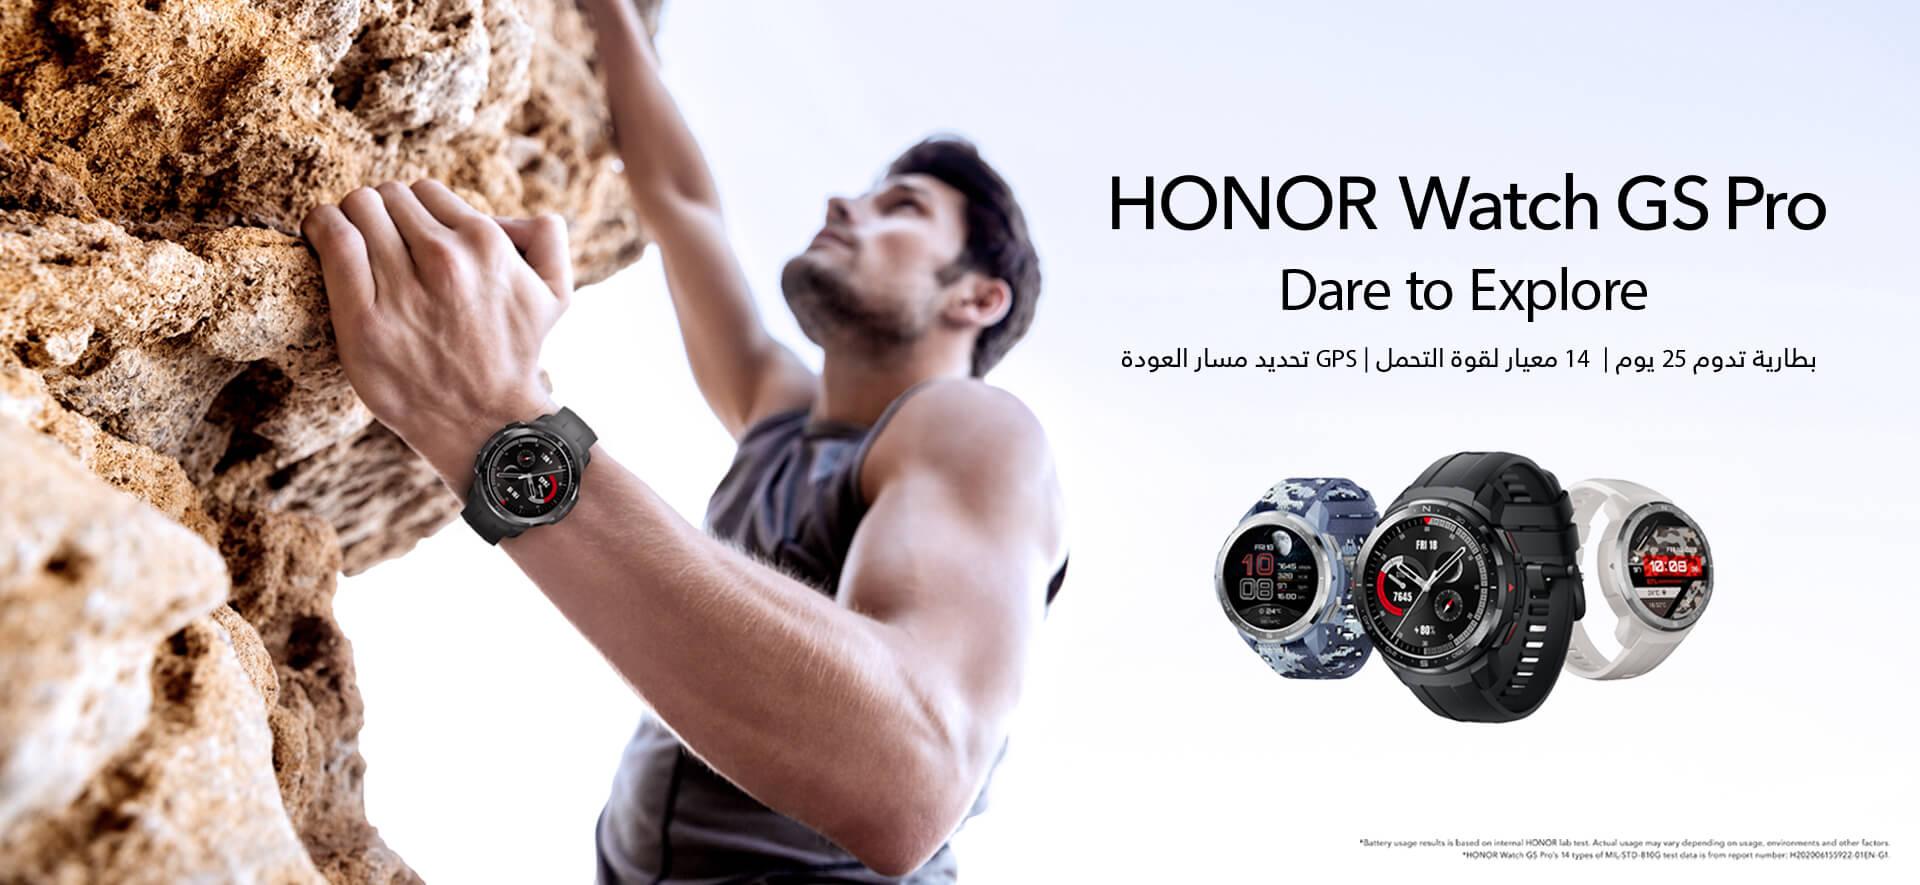 honor-watch-gs-pro